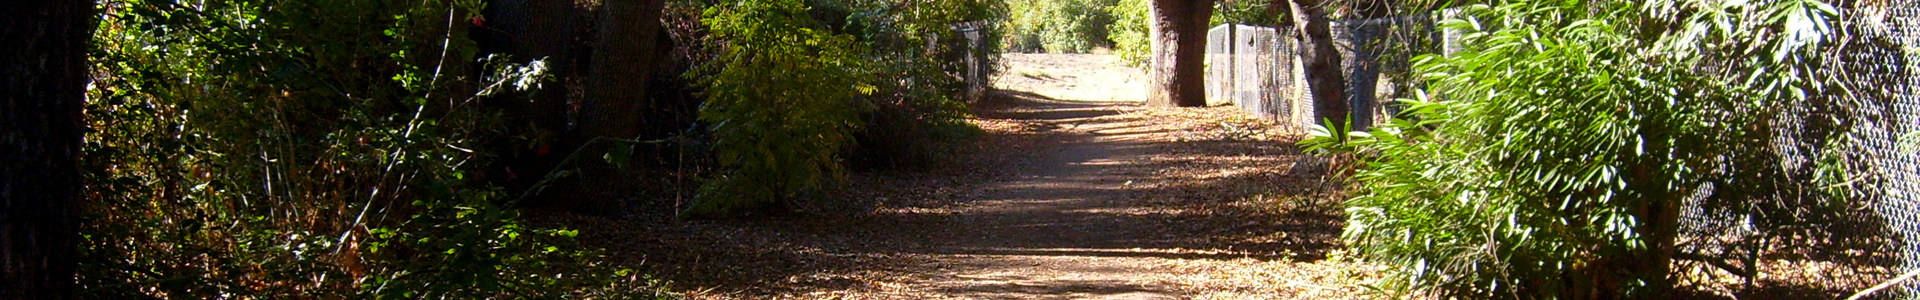 trail-pic-001